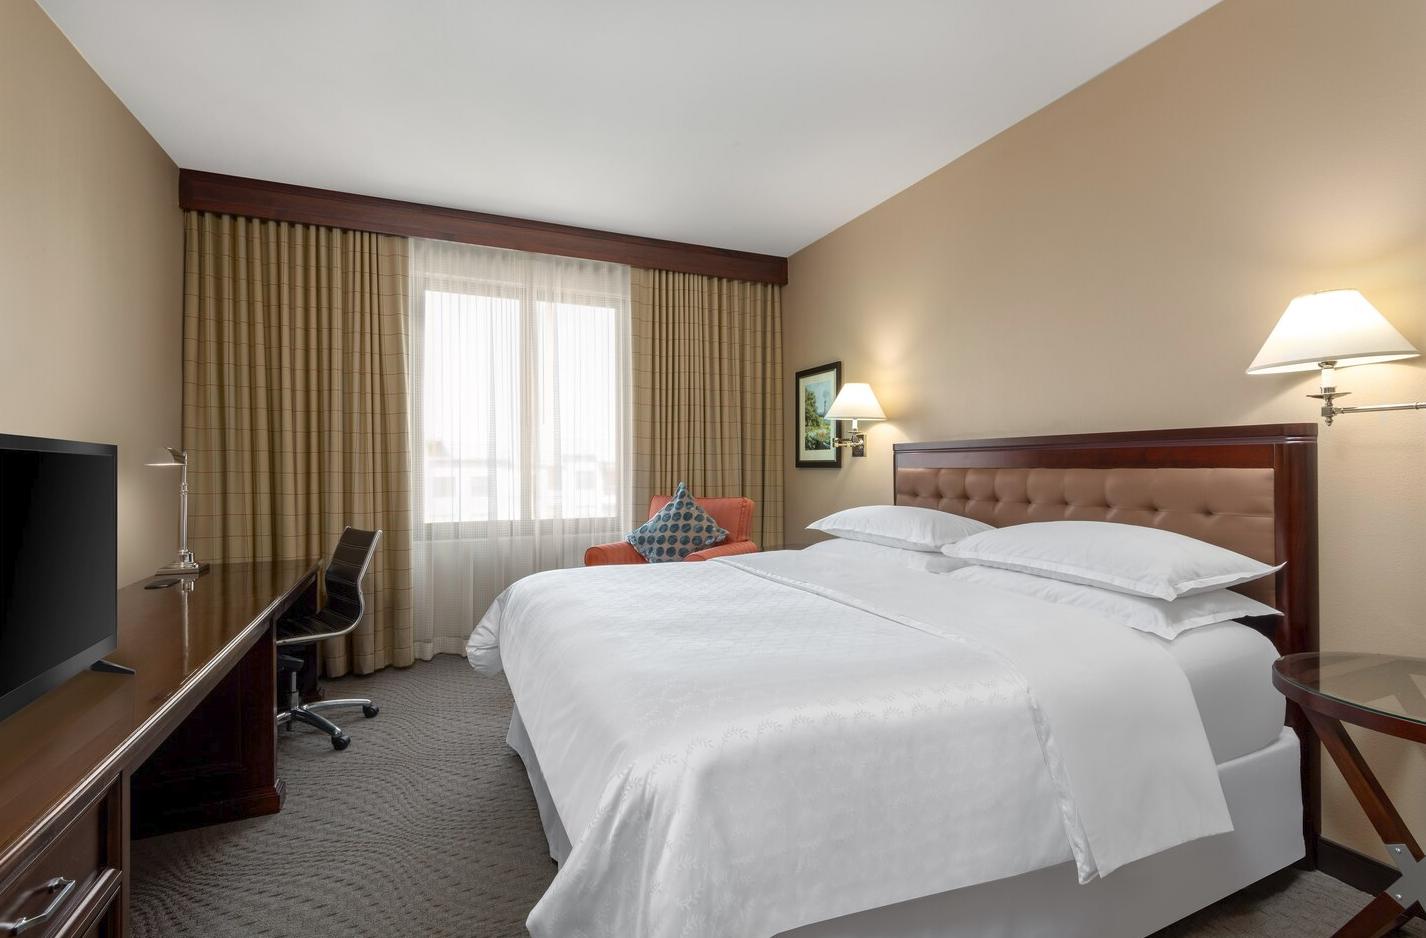 https://www.hotelsbyday.com/_data/default-hotel_image/3/16440/screenshot-2020-04-07-at-4-15-41-pm.png